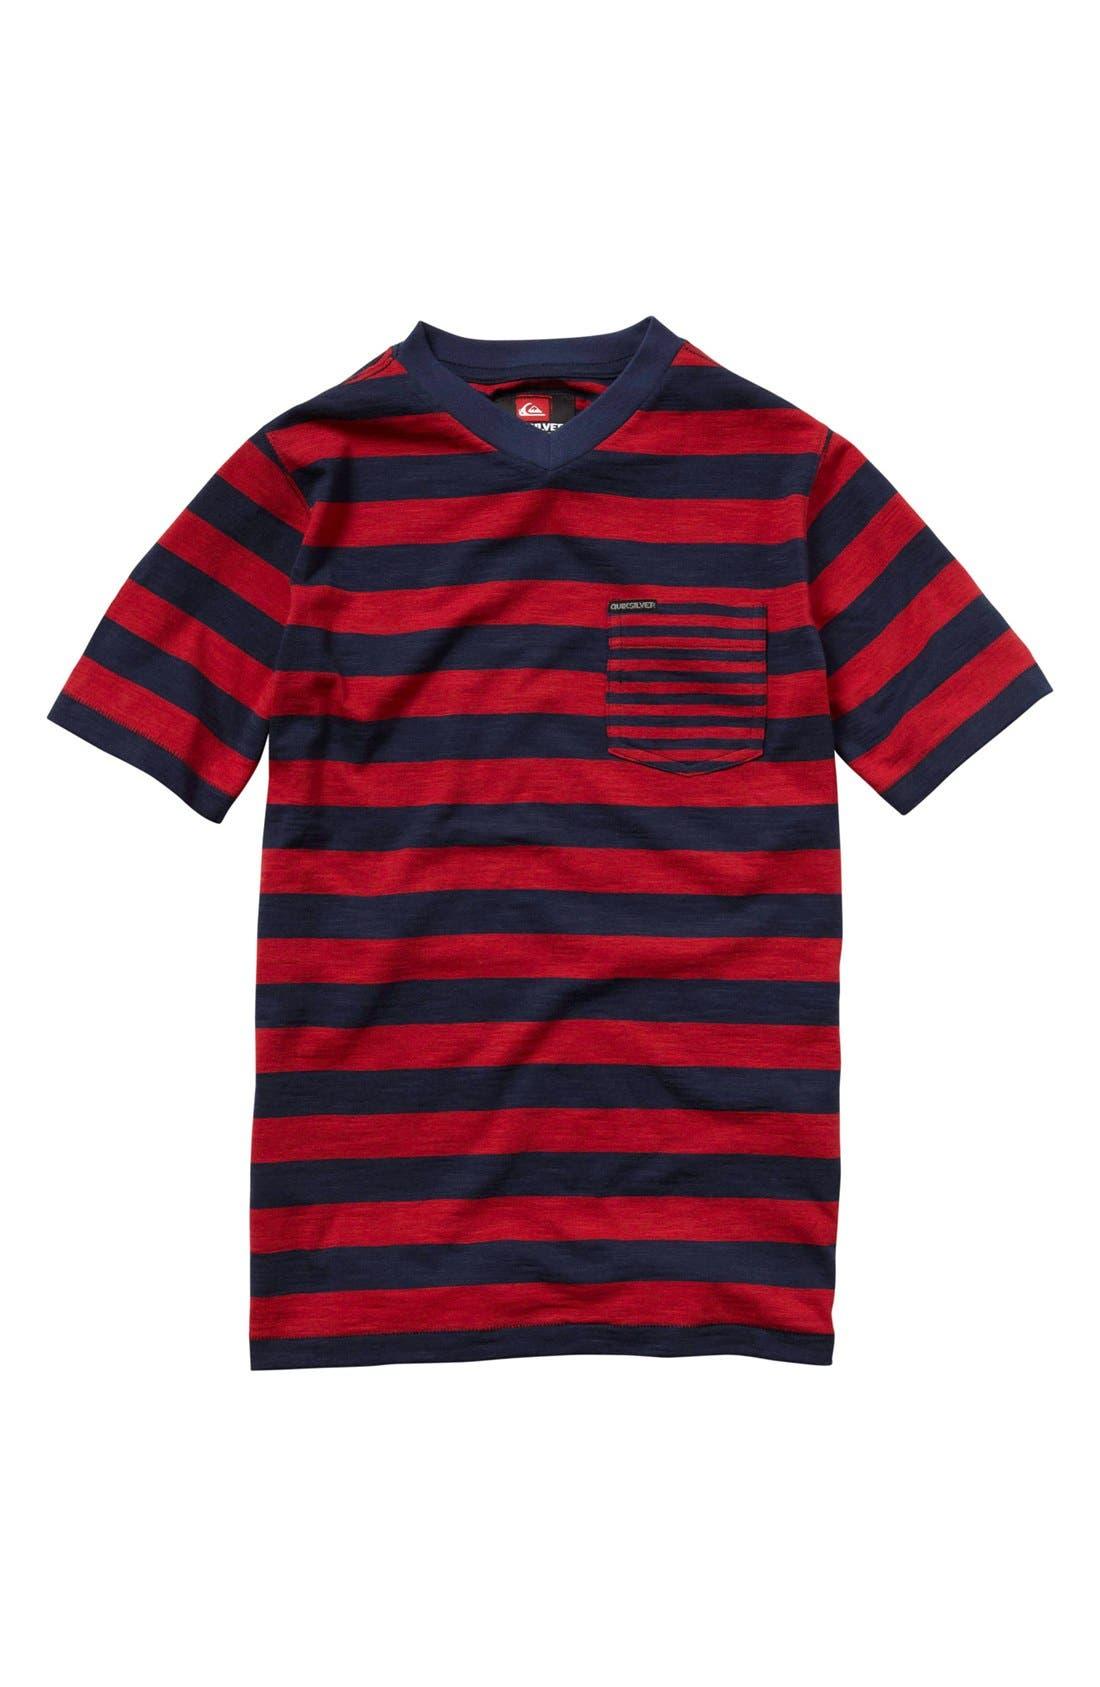 Main Image - Quiksilver 'Brody' T-Shirt (Big Boys)